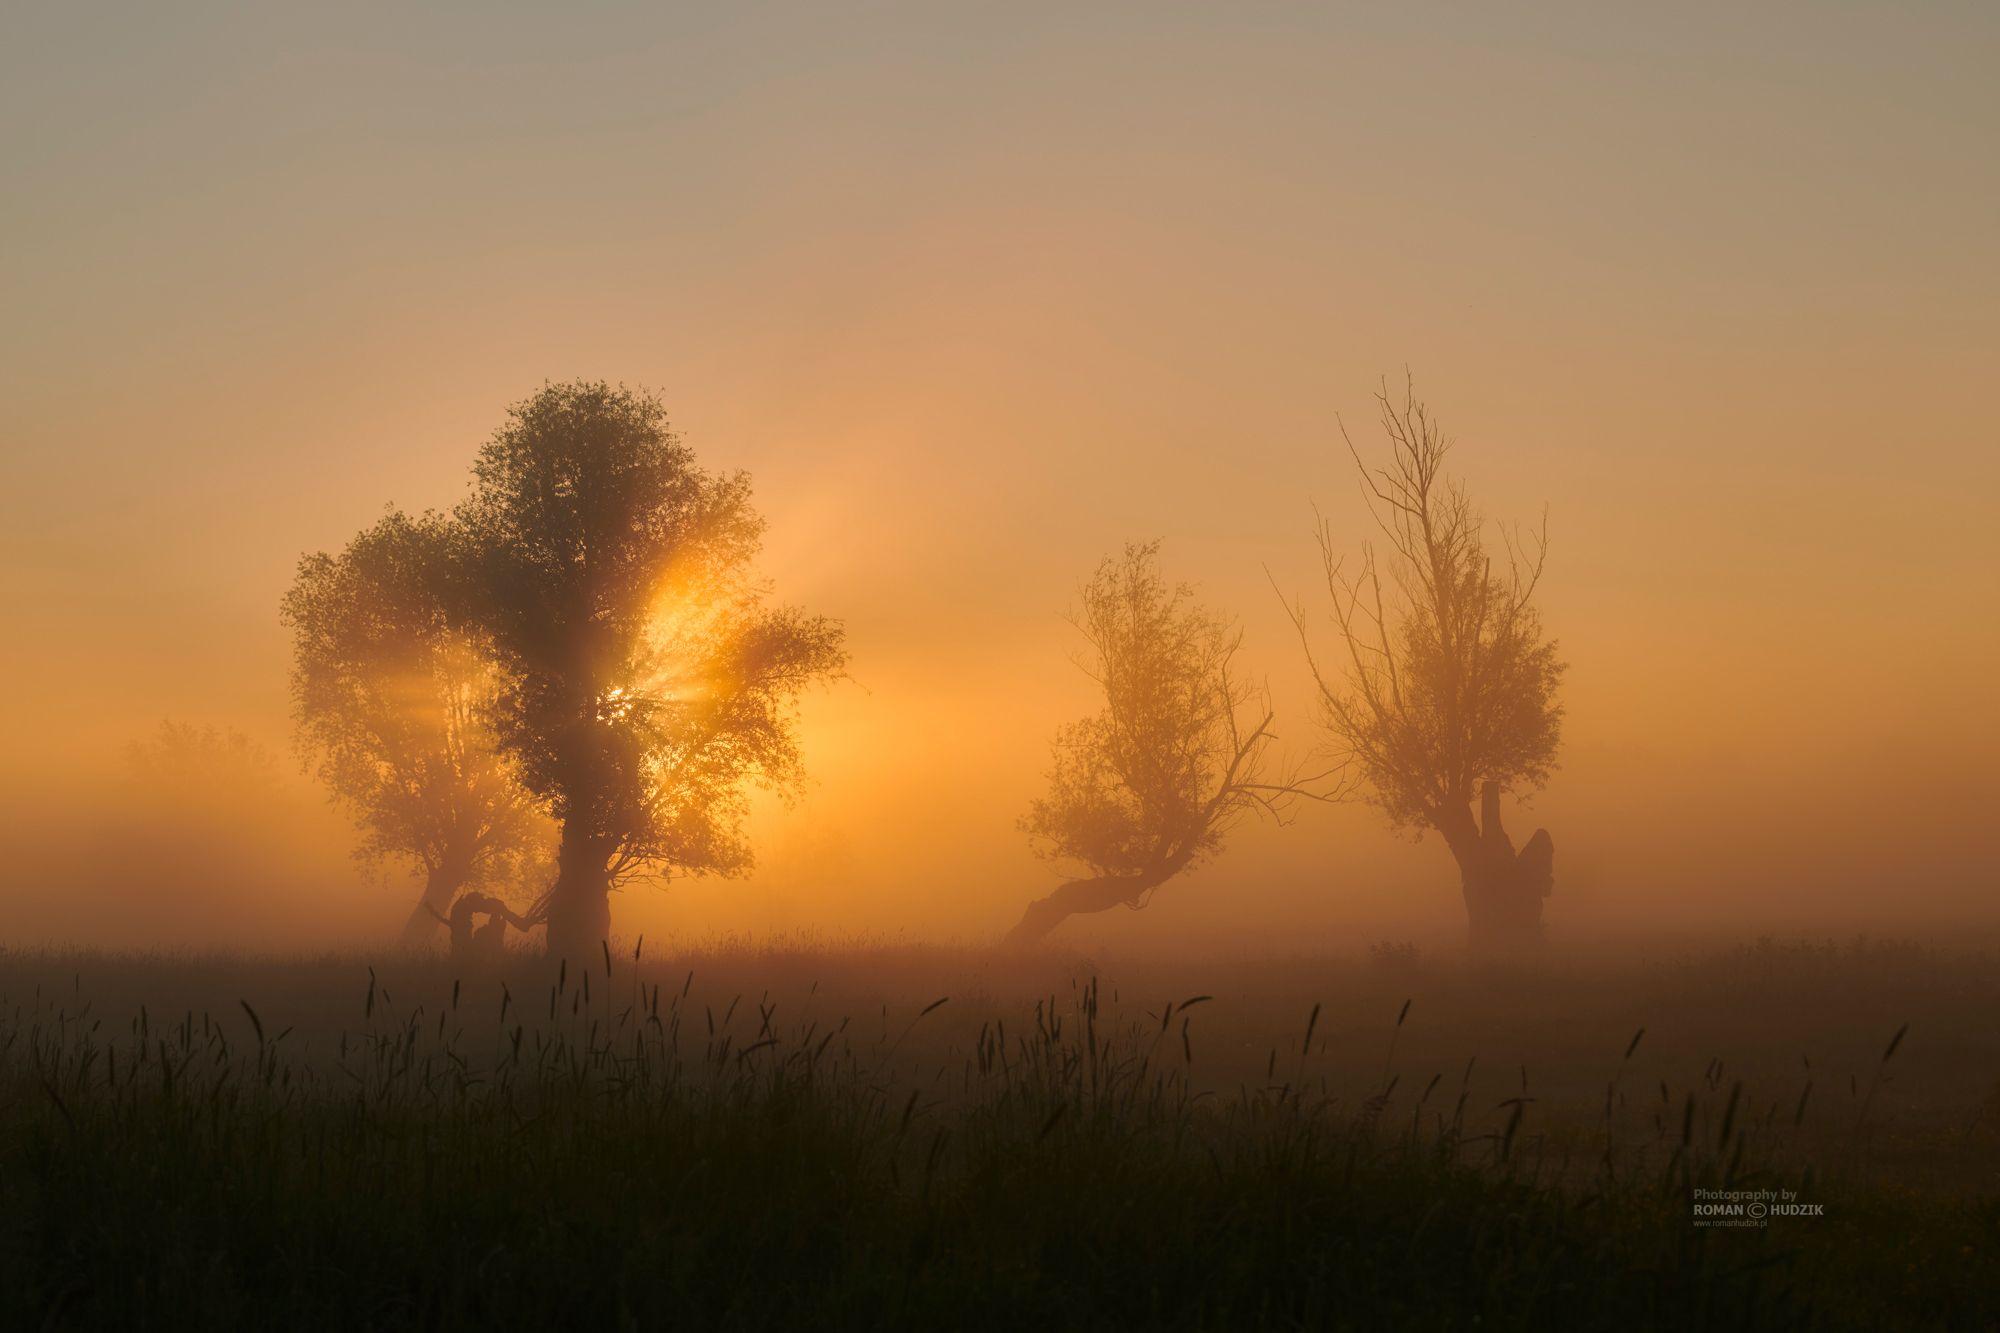 landscape, fog, Poland, trees, field, sunrise, Hudzik Roman